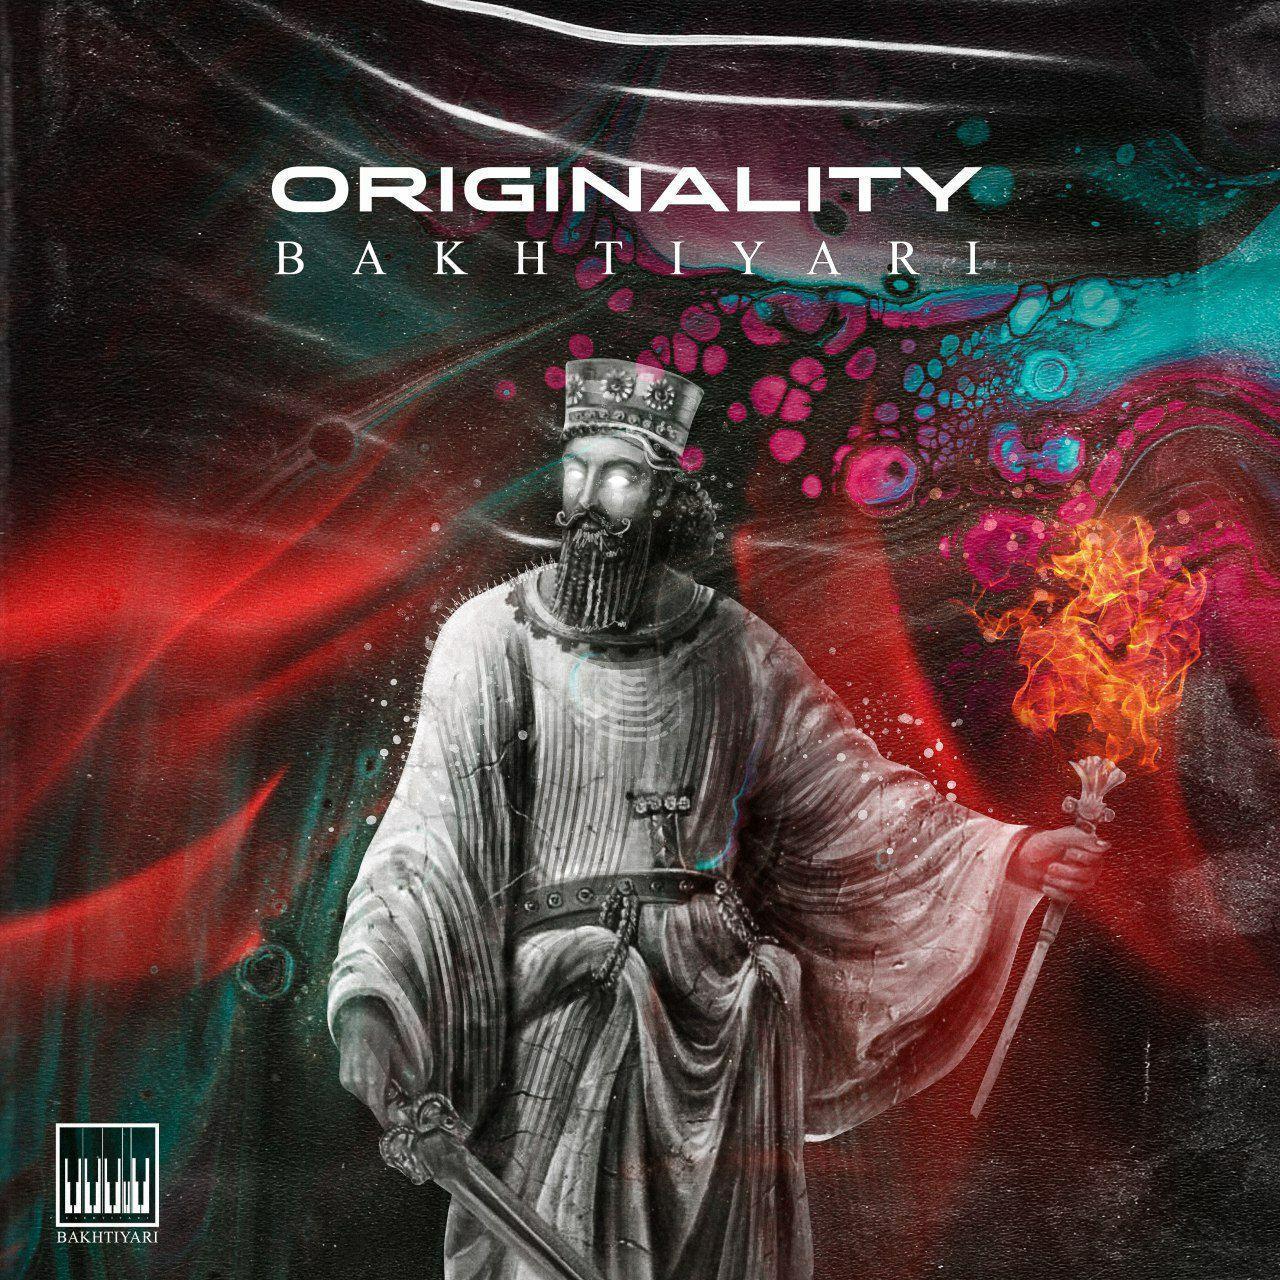 Bakhtiyari - Originality